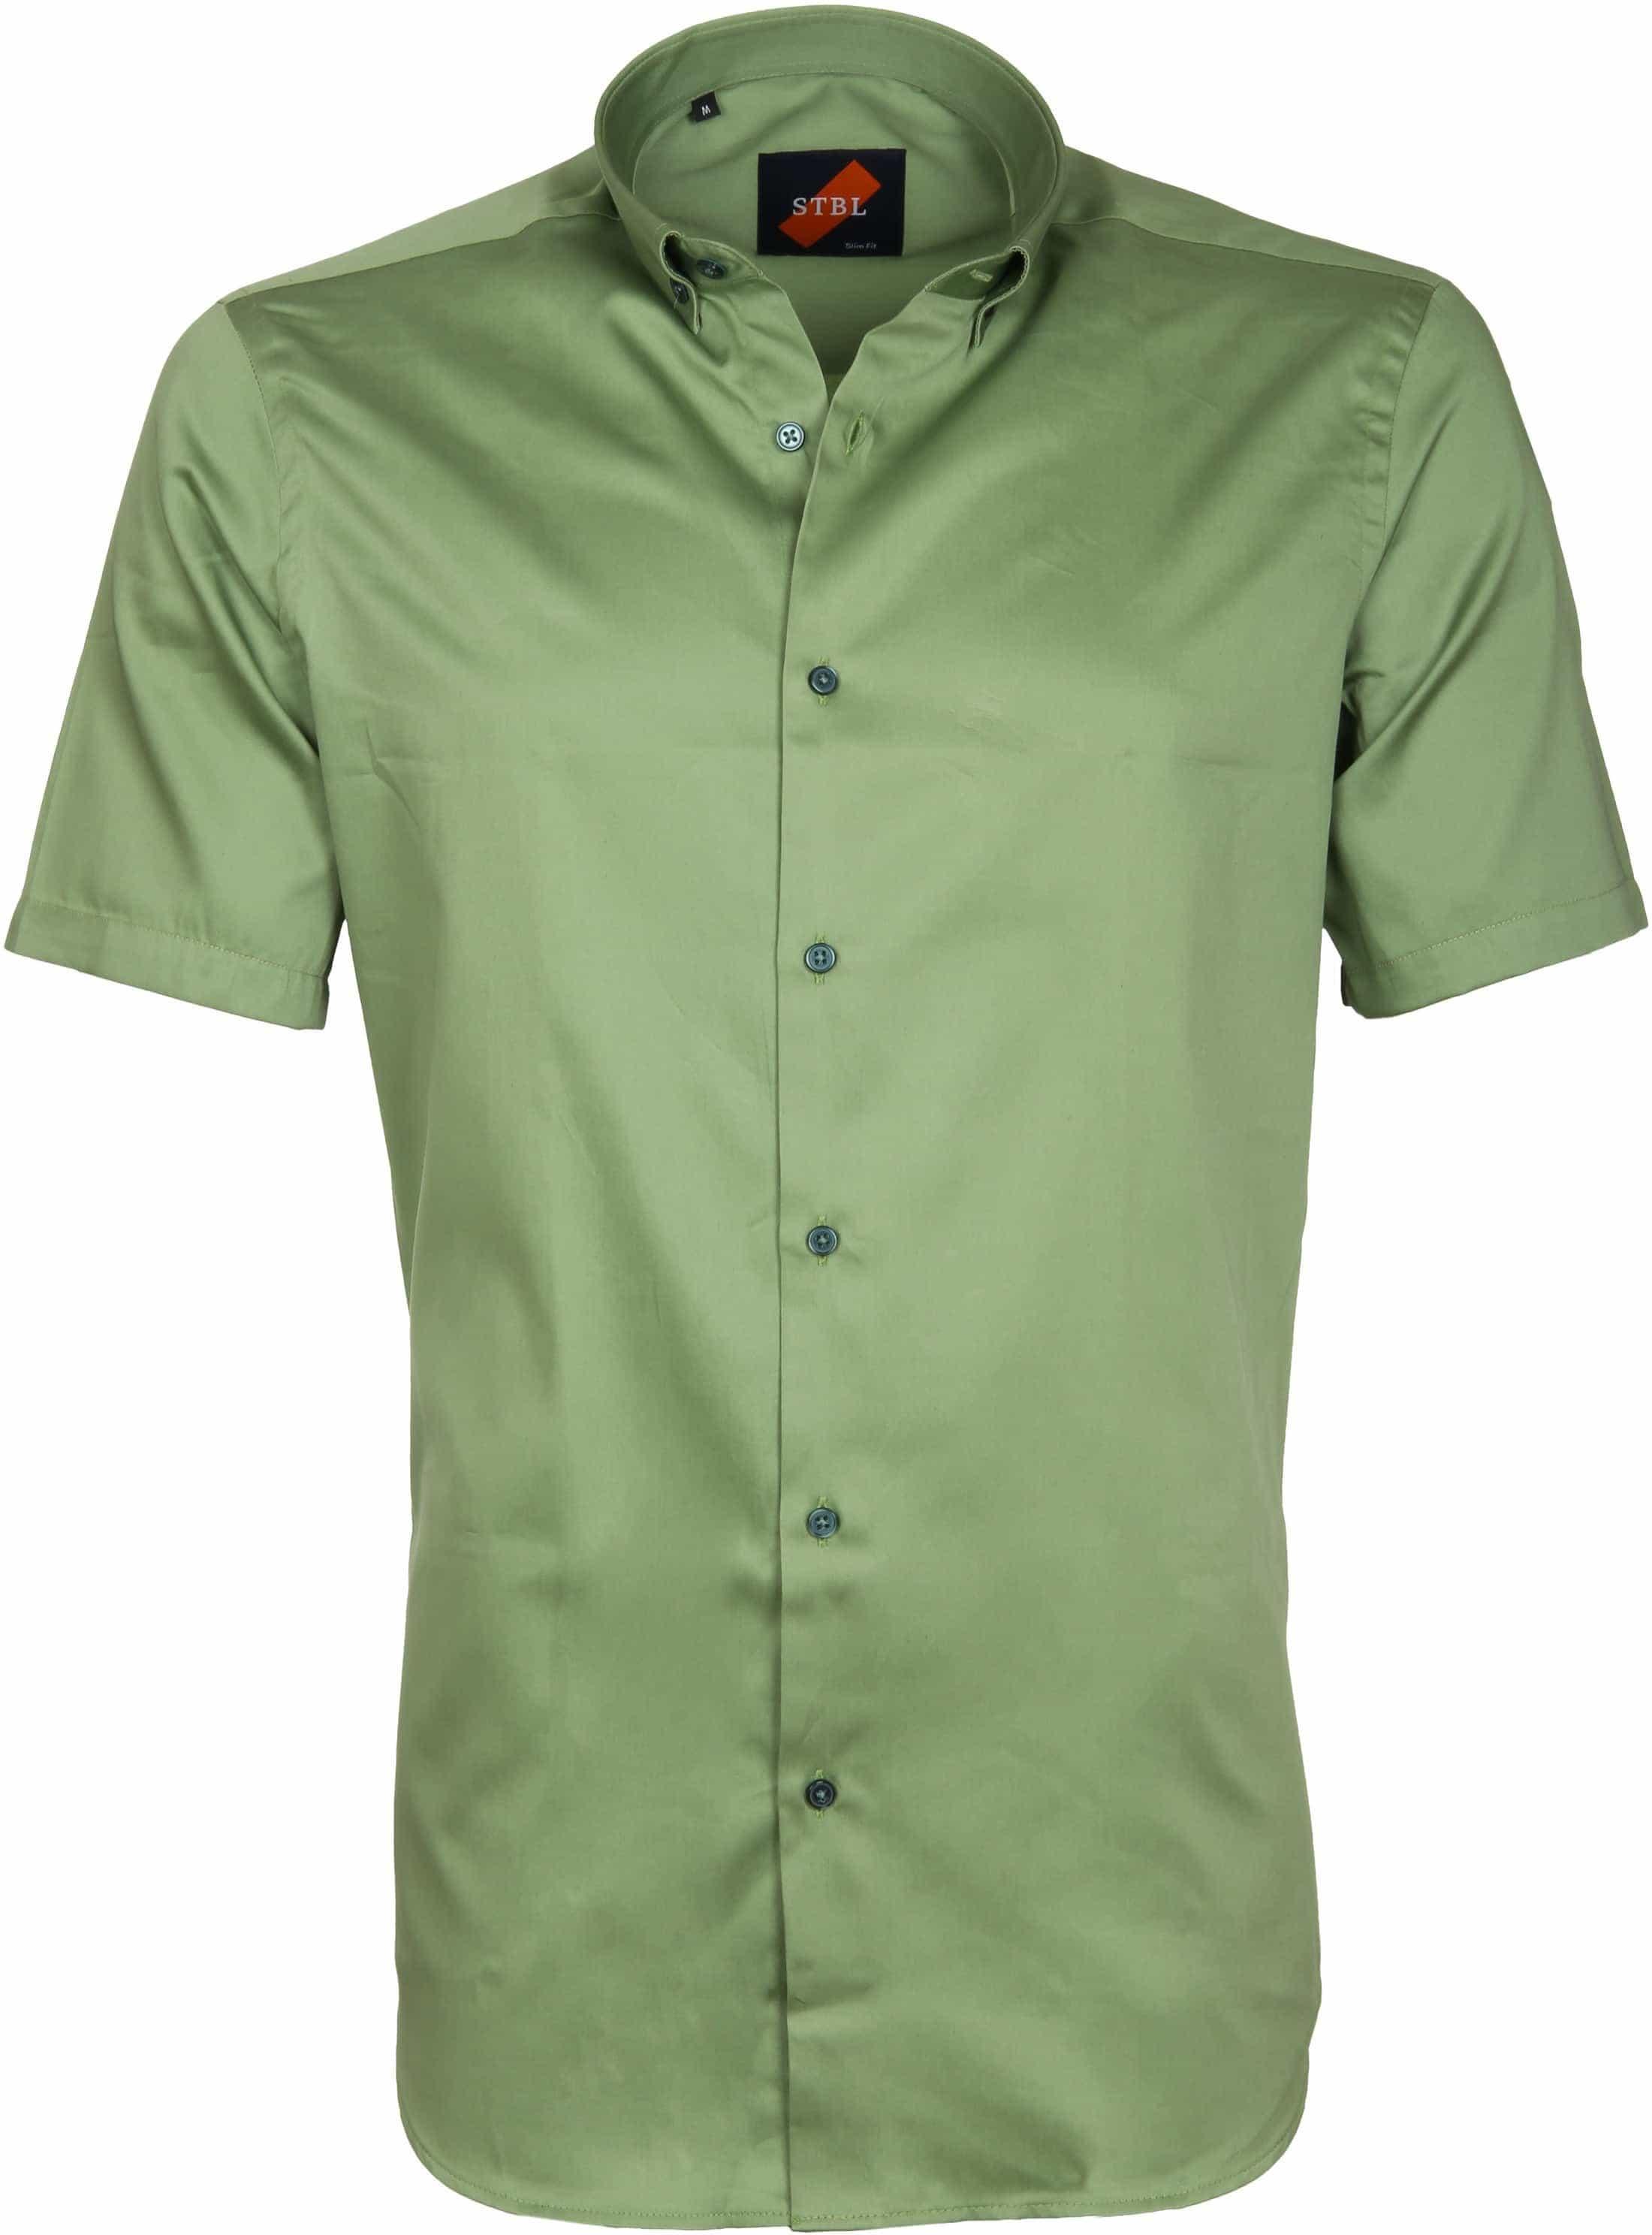 Overhemd Mintgroen.Casual Overhemd Basic Groen S4km 03 Green Satin Online Bestellen